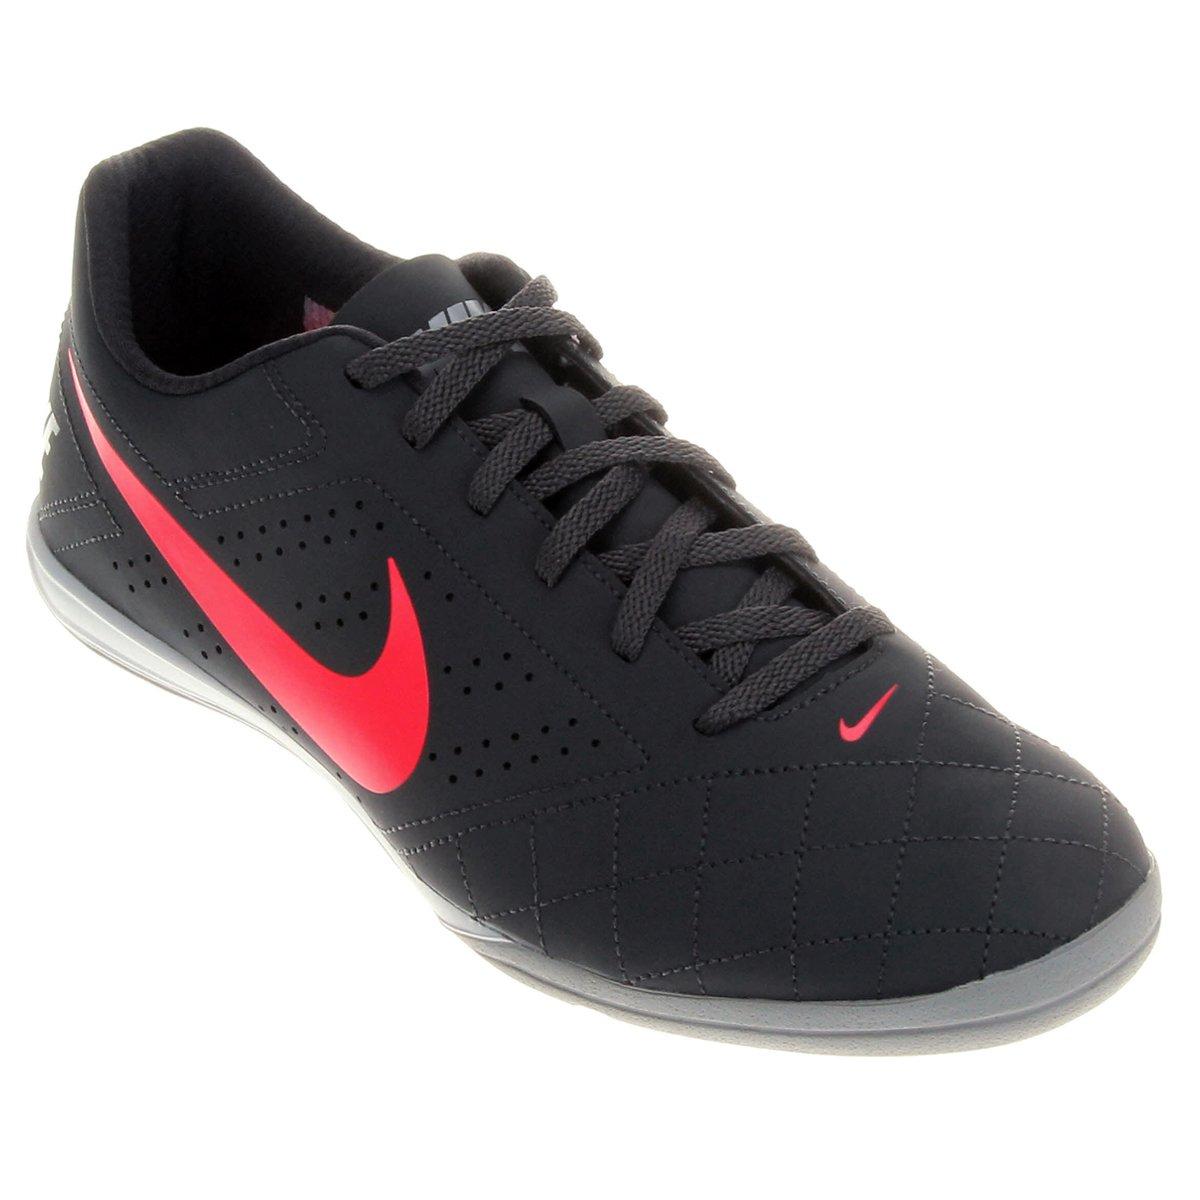 b9a768cfe1 Chuteira Futsal Nike Beco 2 Futsal - Chumbo e Rosa - Compre Agora ...